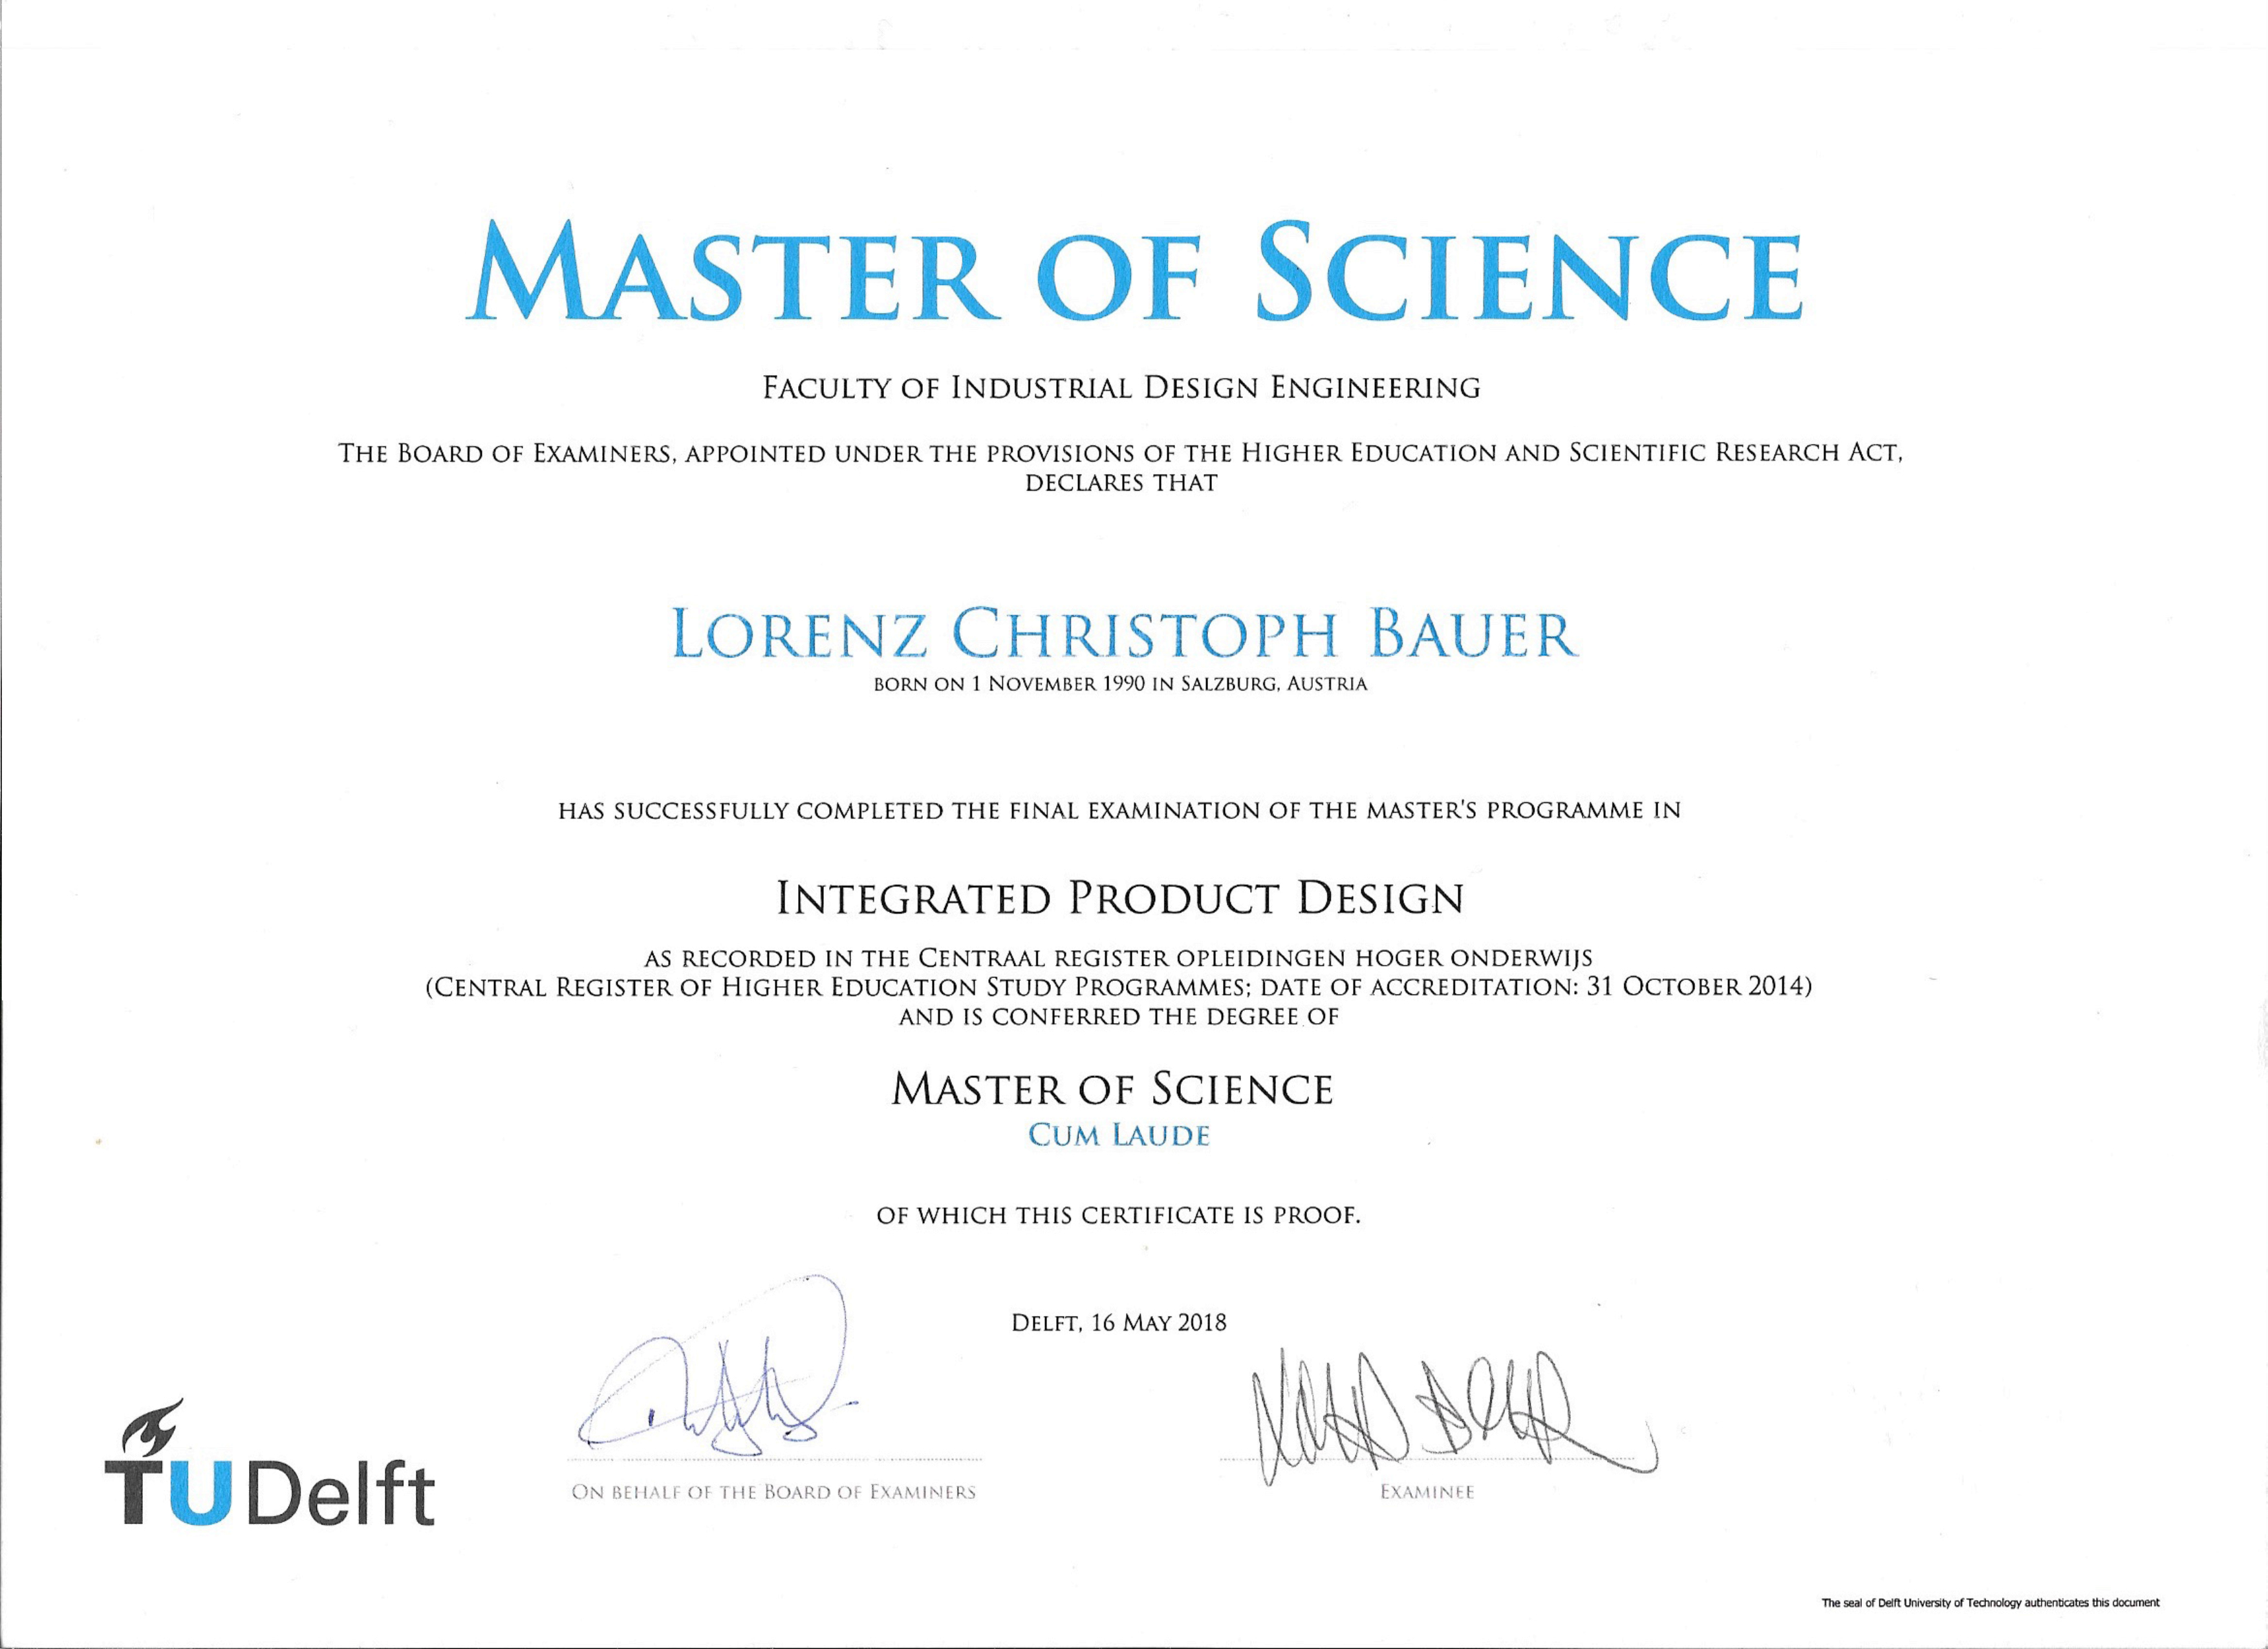 Lorenz MSc Certificate